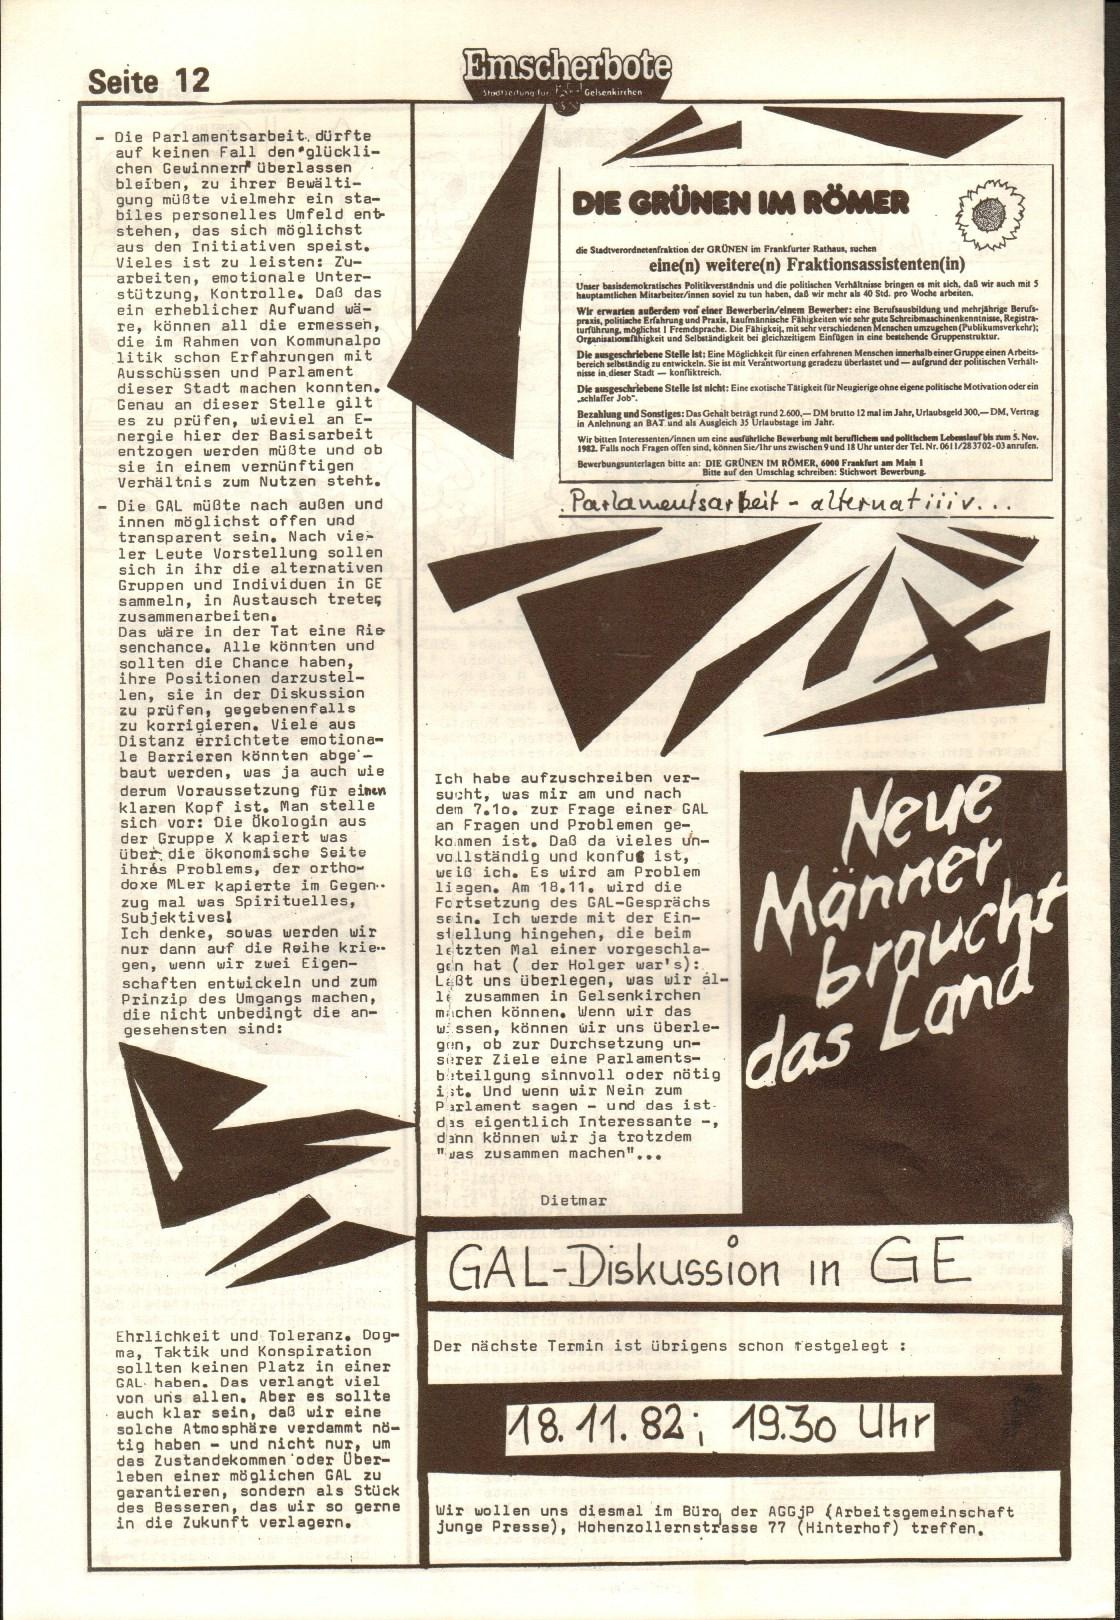 Gelsenkirchen_Emscherbote_1982_22_12